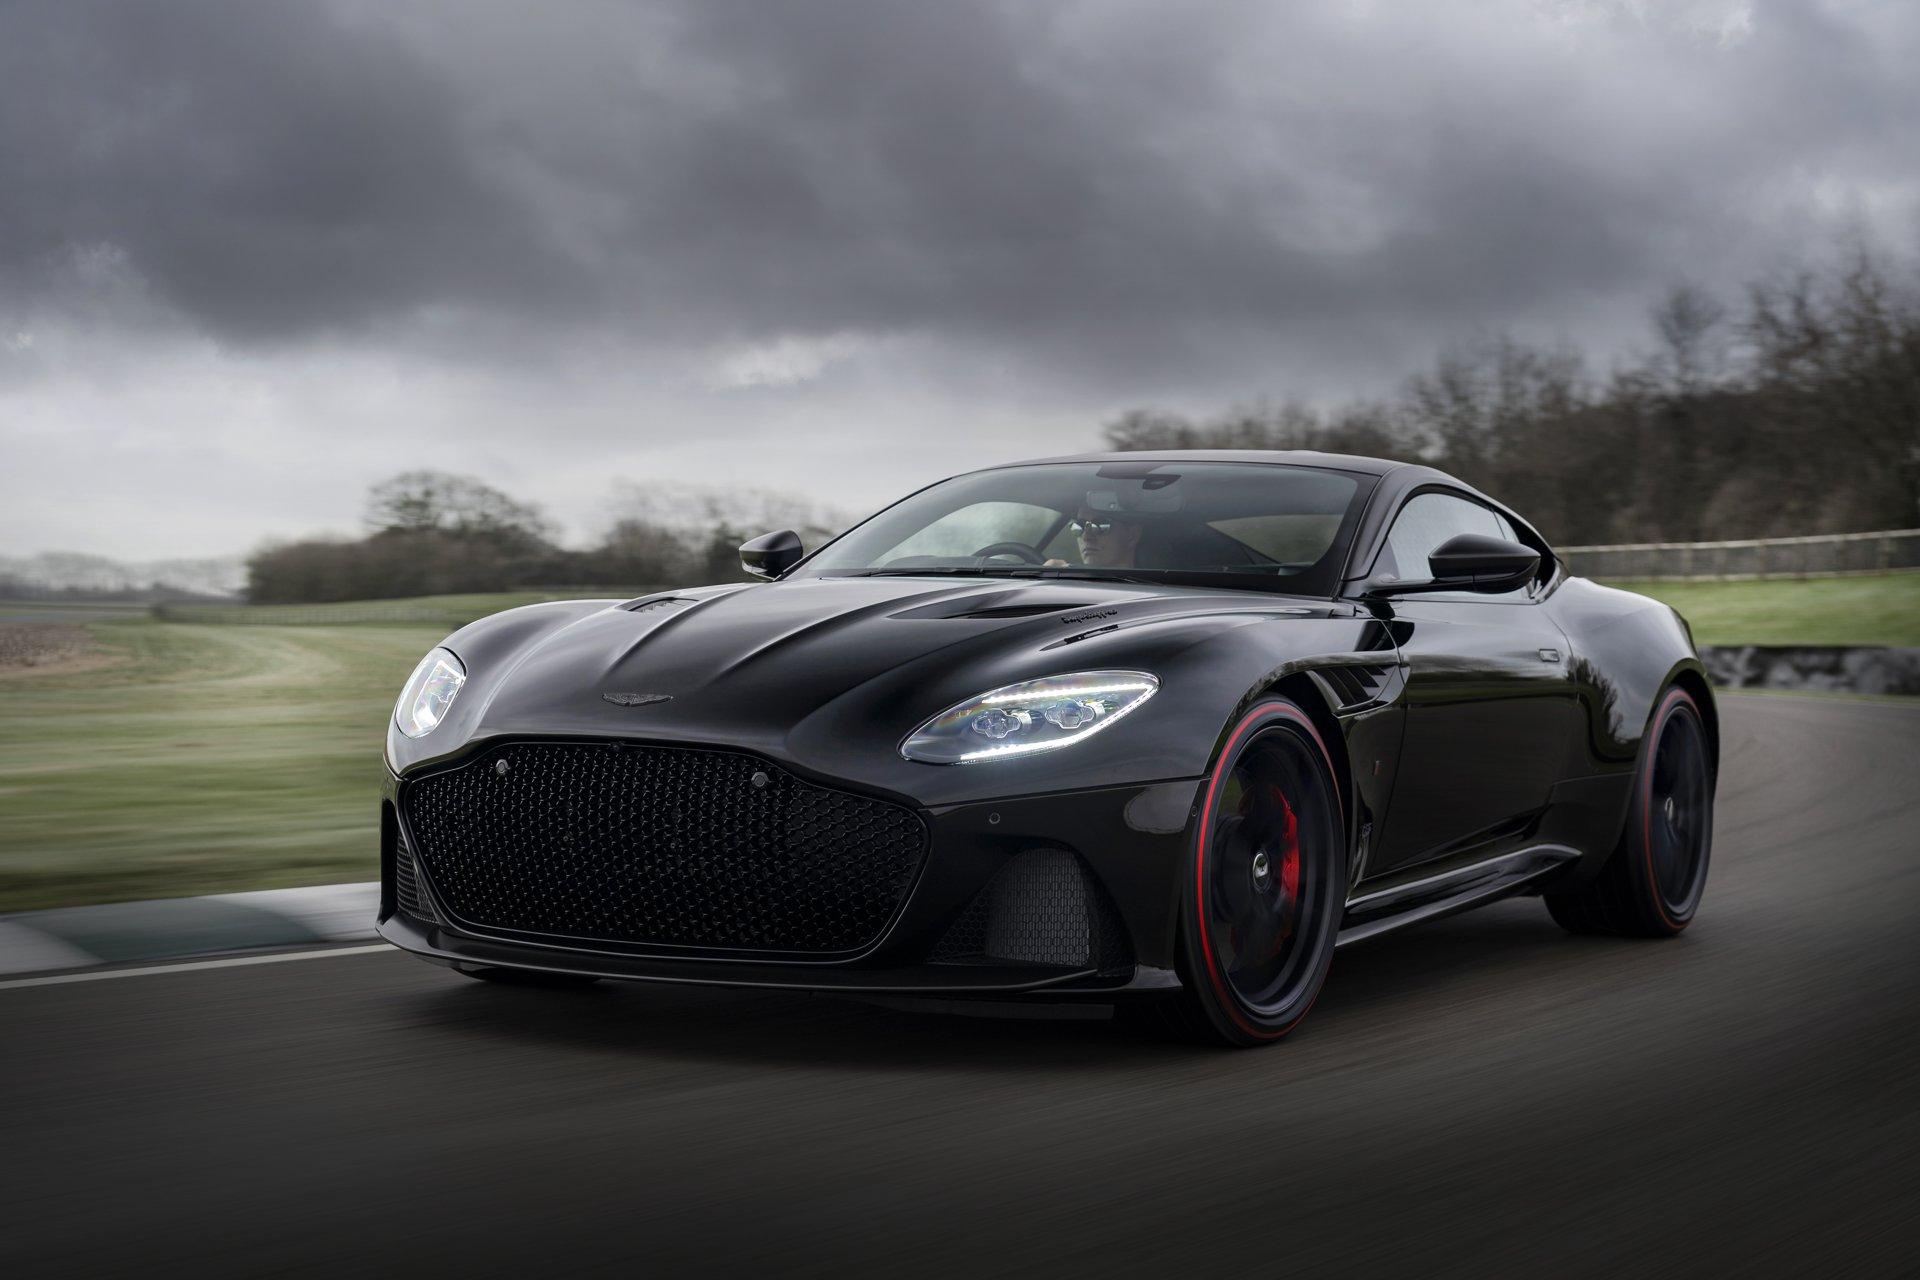 Press Release Aston Martin Dbs Superleggera Tag Heuer Edition Watch I Love